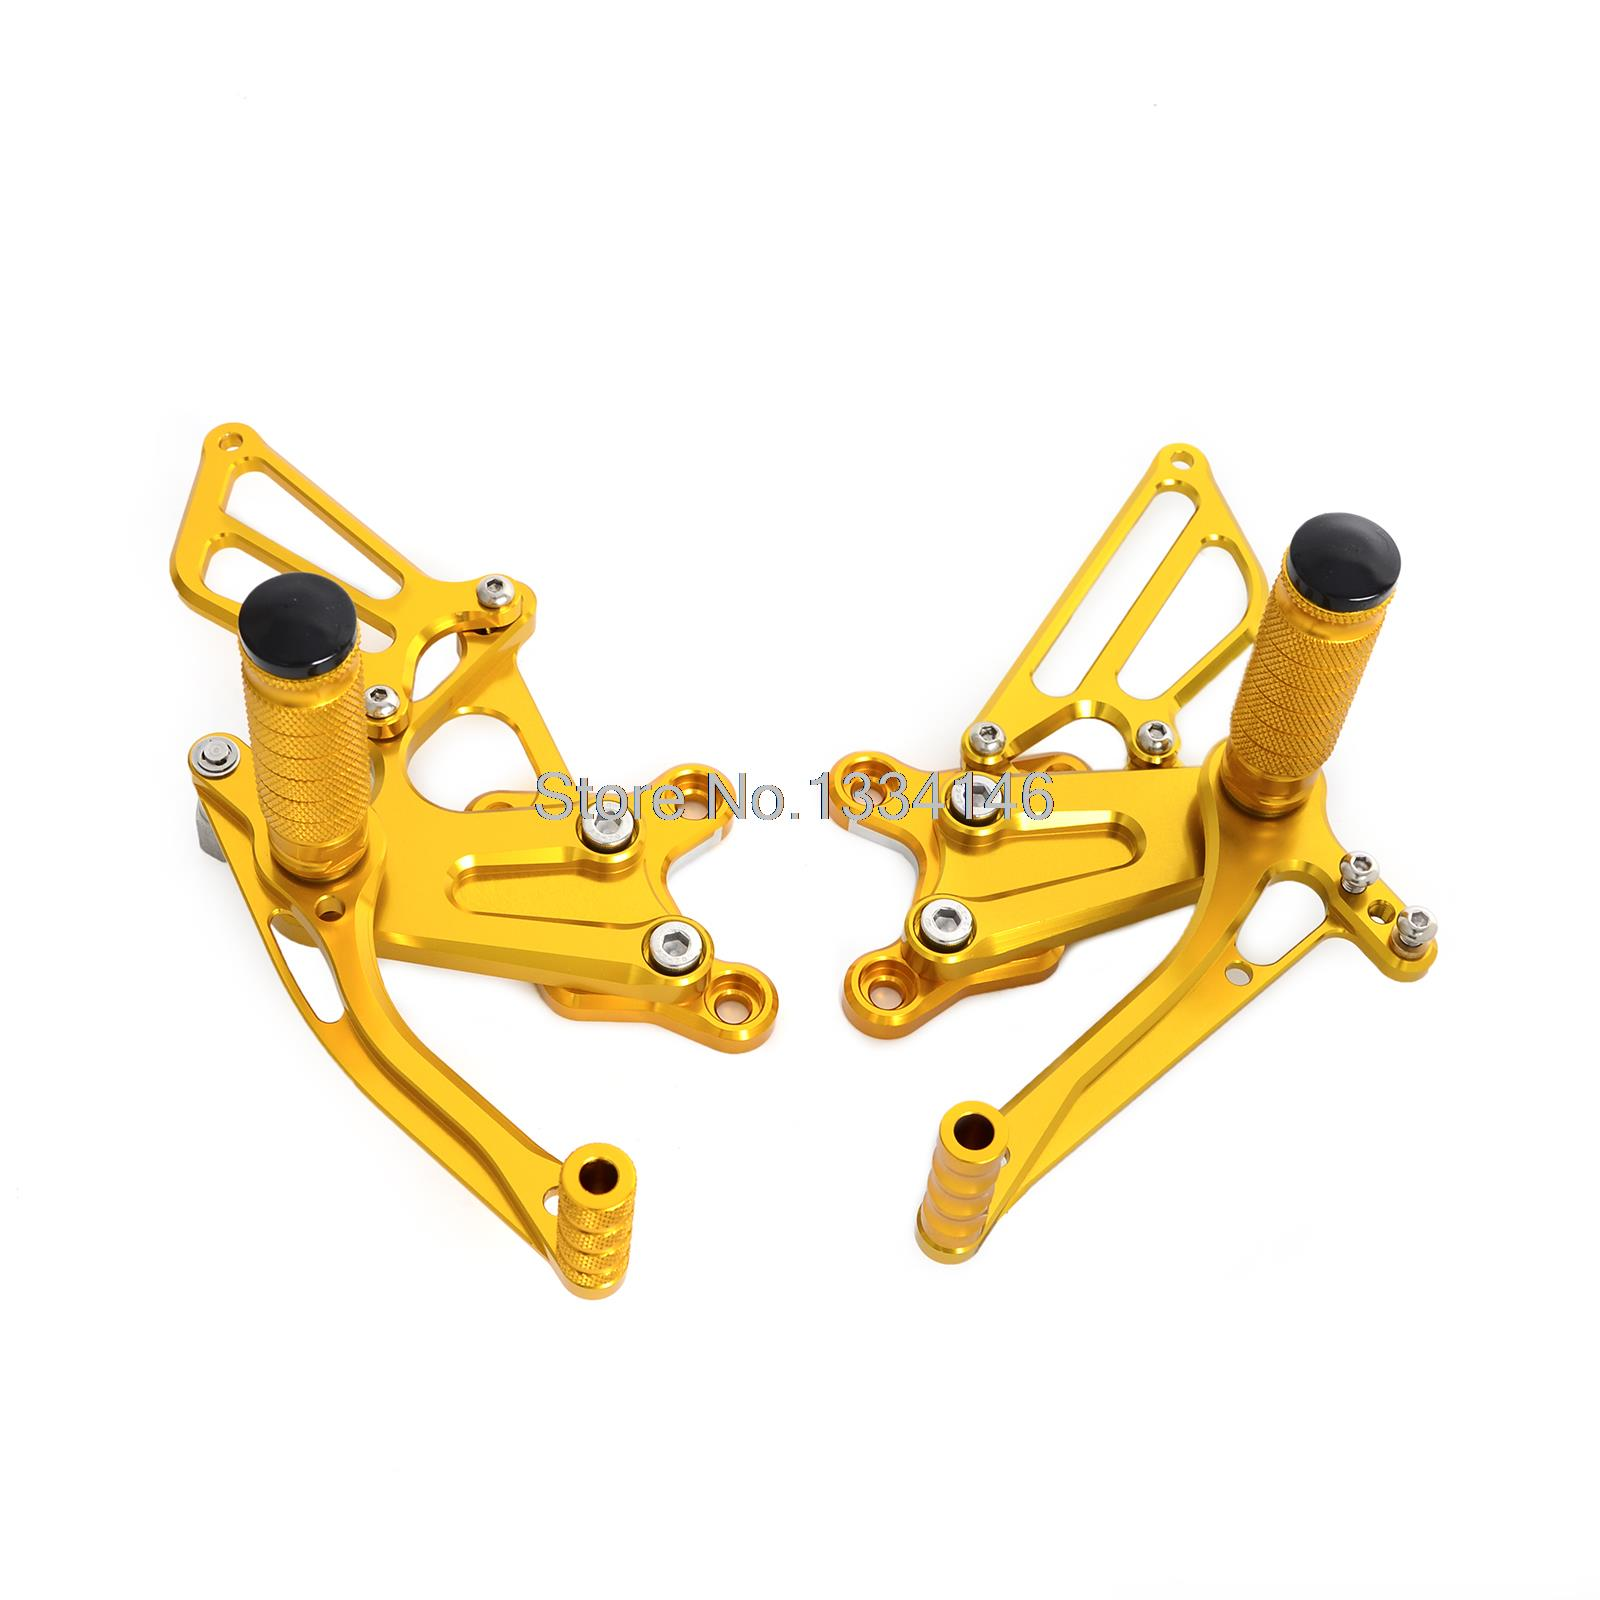 Racing CNC Foot Control Adjustable Rearset Foot Peg Rear Sets For Honda CBR954 CBR954RR 2002 2003 Gold l r pillion foot peg for honda c70 ct90 cb125 cb200 cg110 cg125 jx110 jx125 xl250 xl350